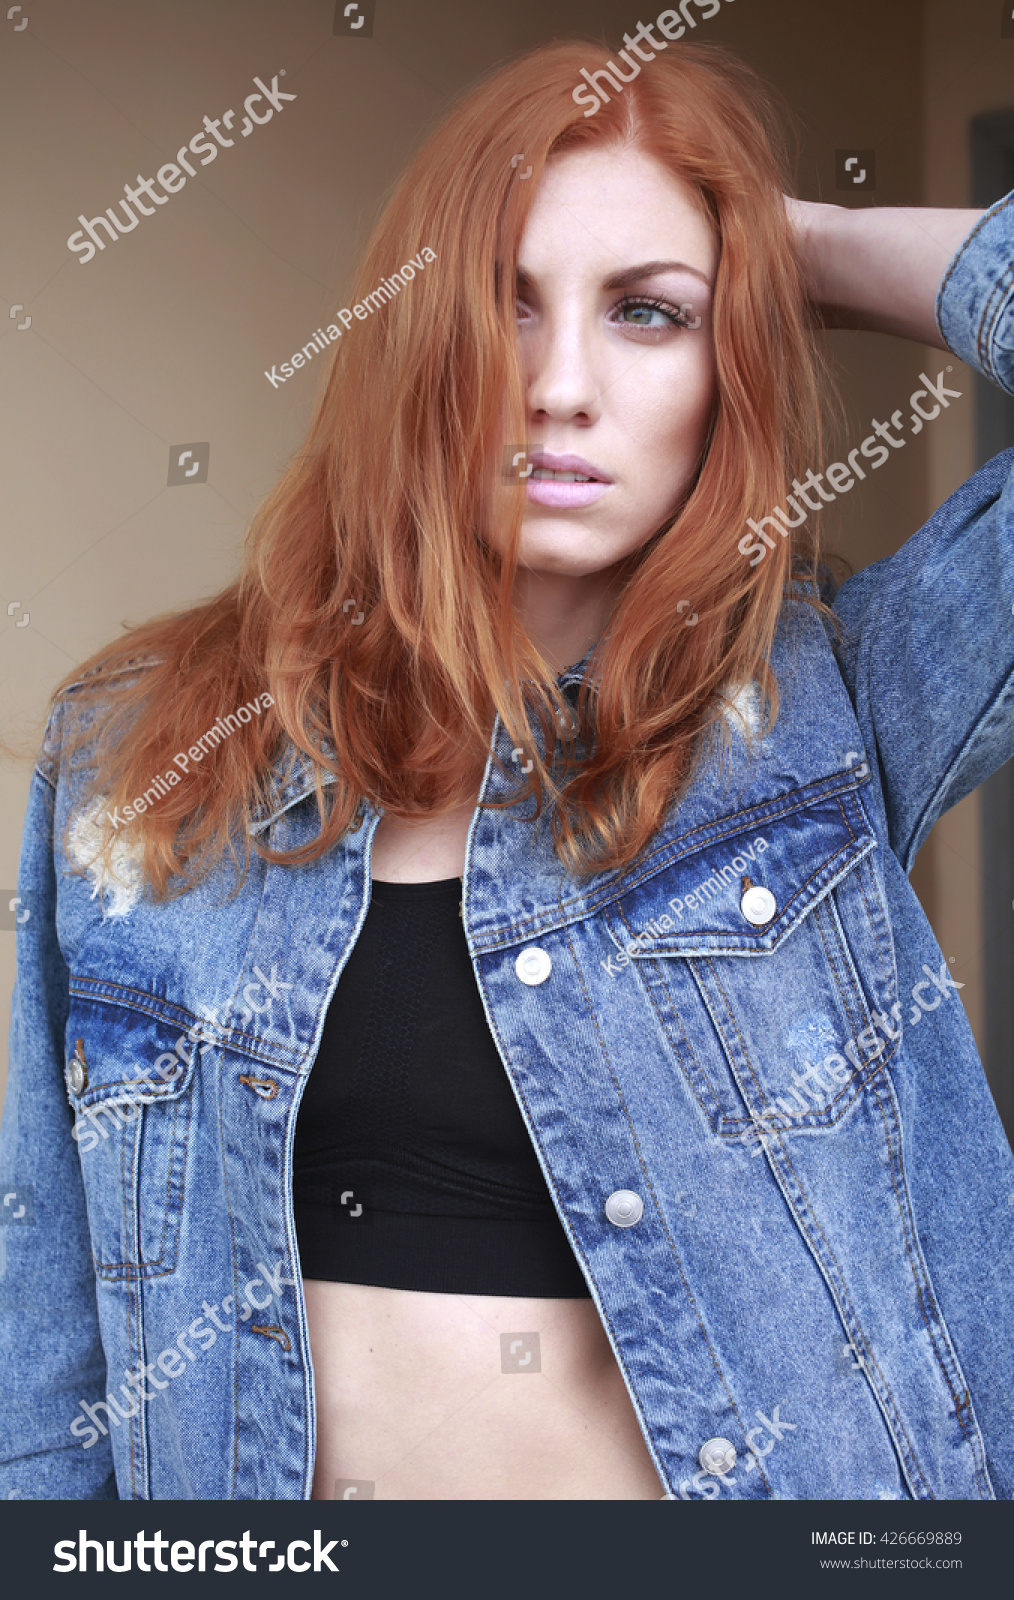 Redhead nonude models